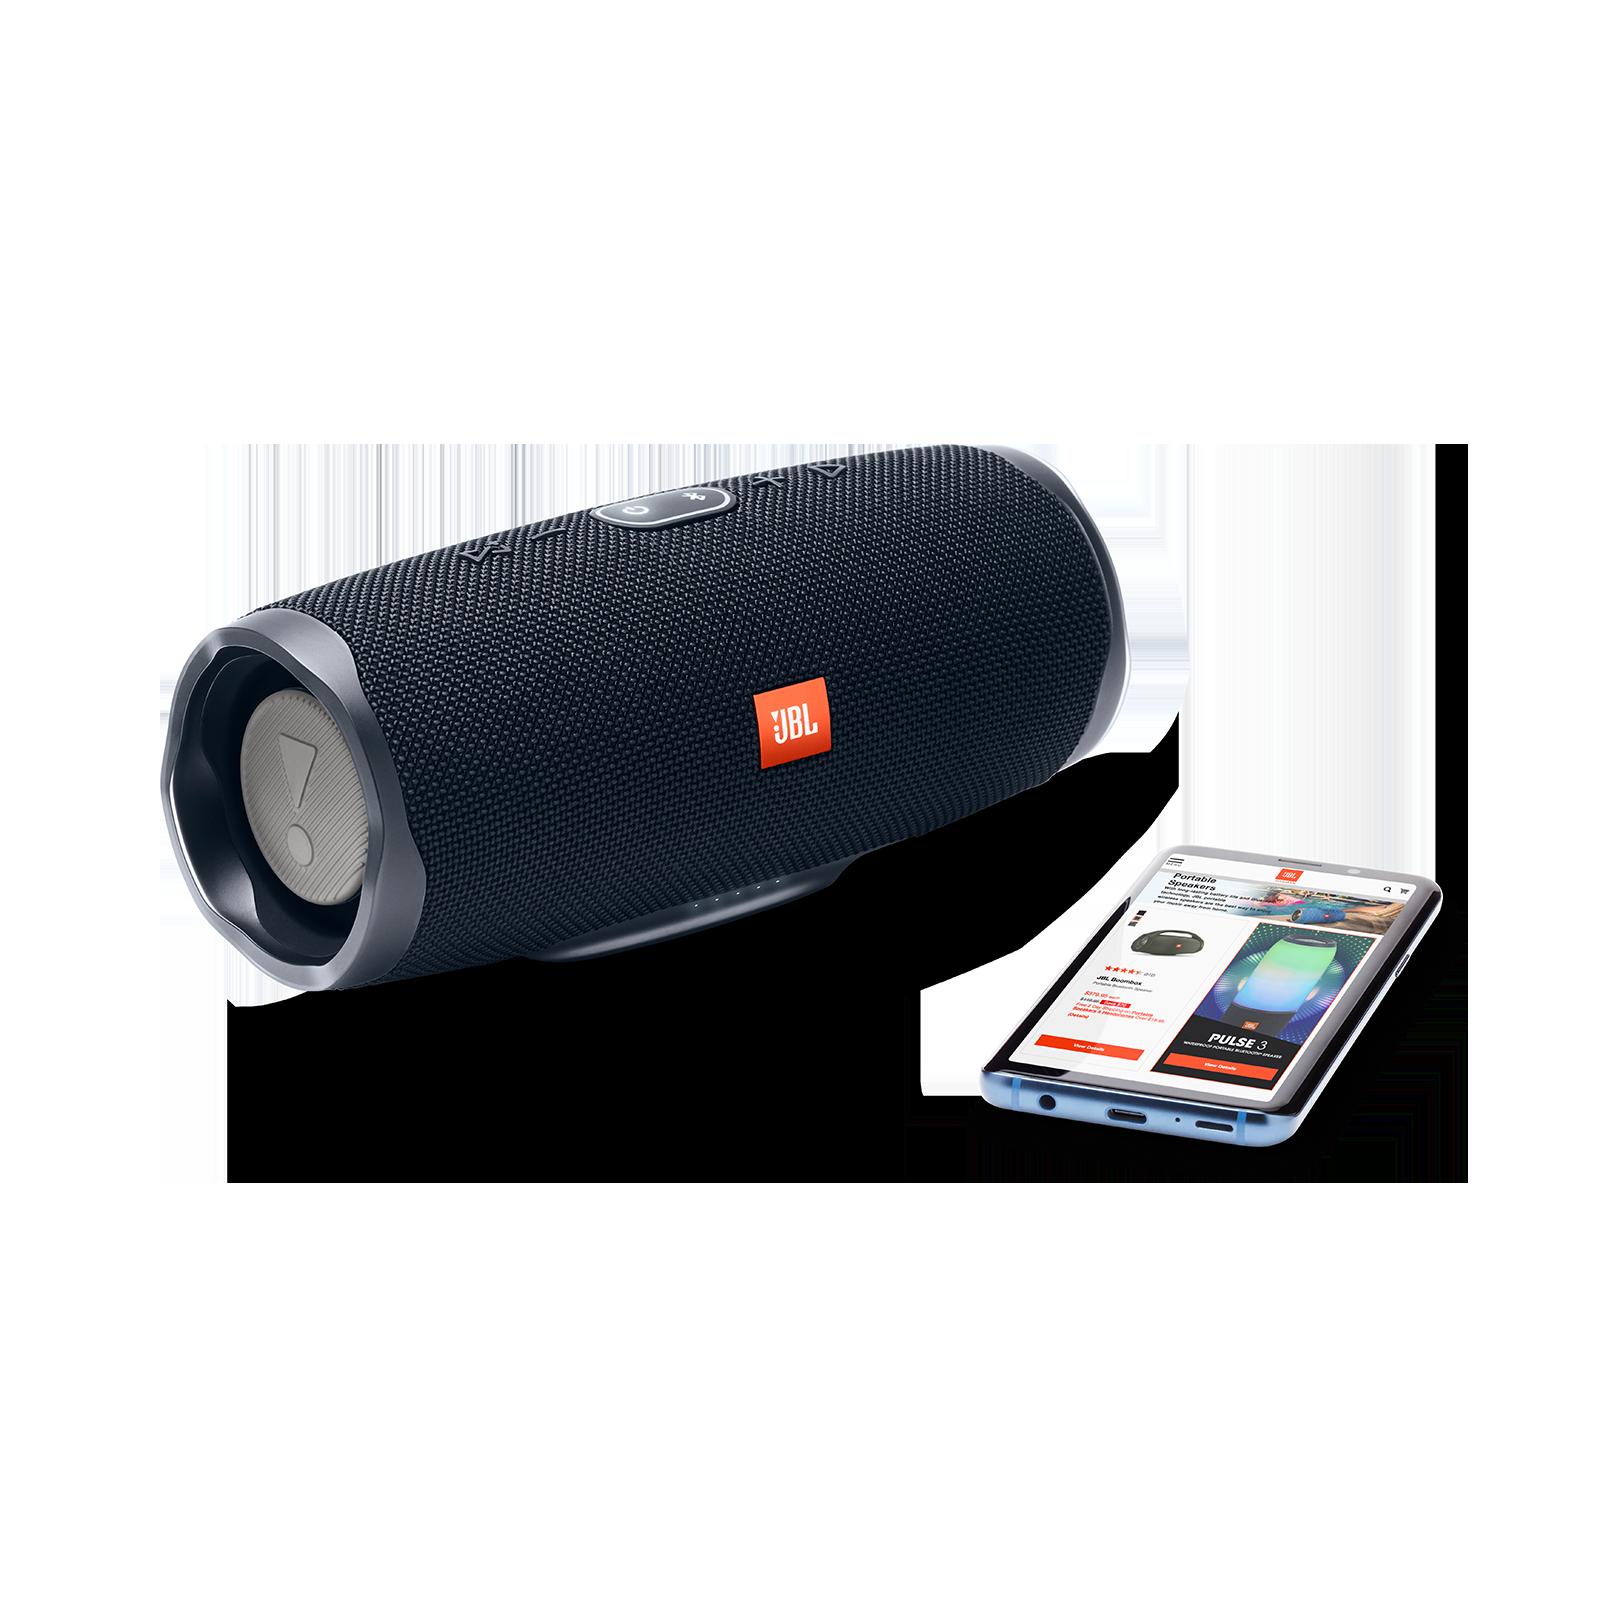 Altavoz inal/ámbrico port/átil con Bluetooth Cargador USB de Pared de Dos Puertos JBL Charge 4 Basics